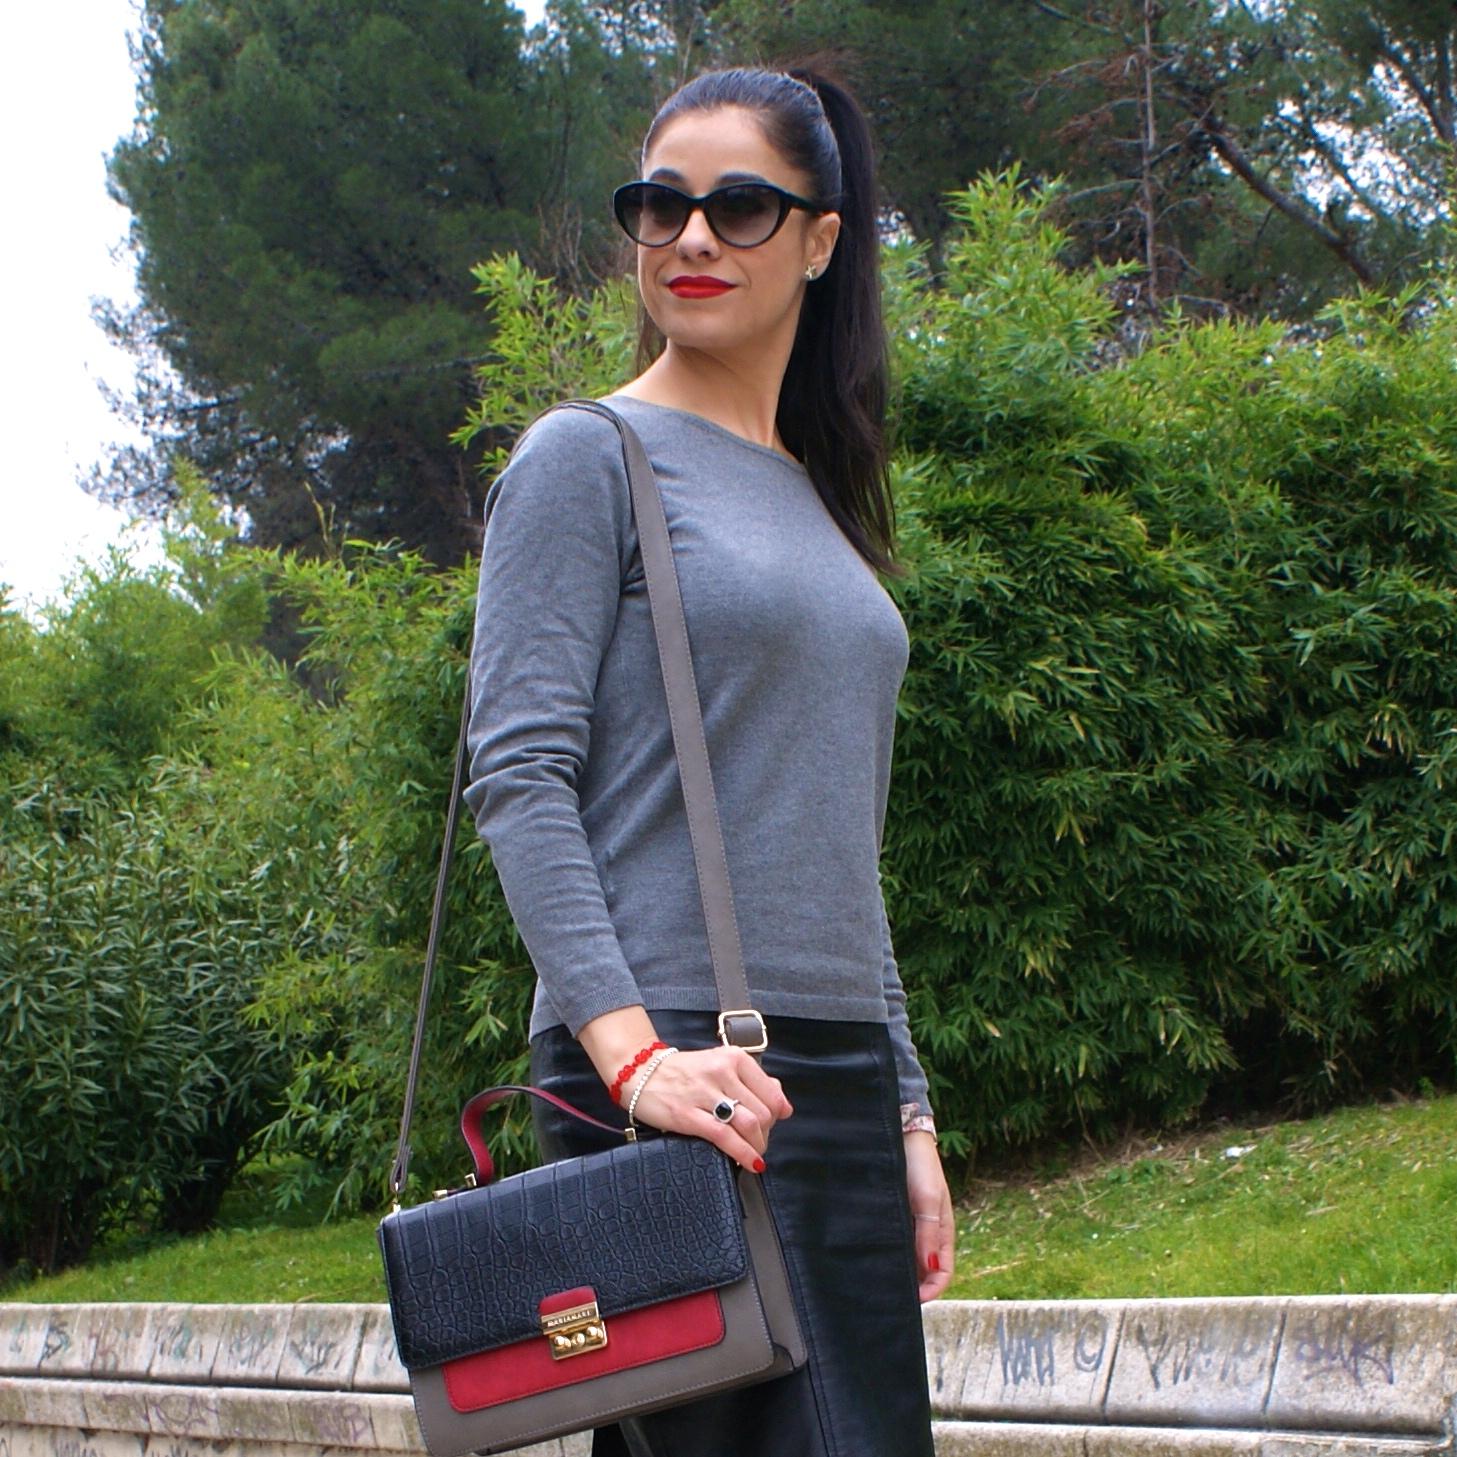 la caprichossa, blog de moda, invierno, estilo, t-strap, mariamare